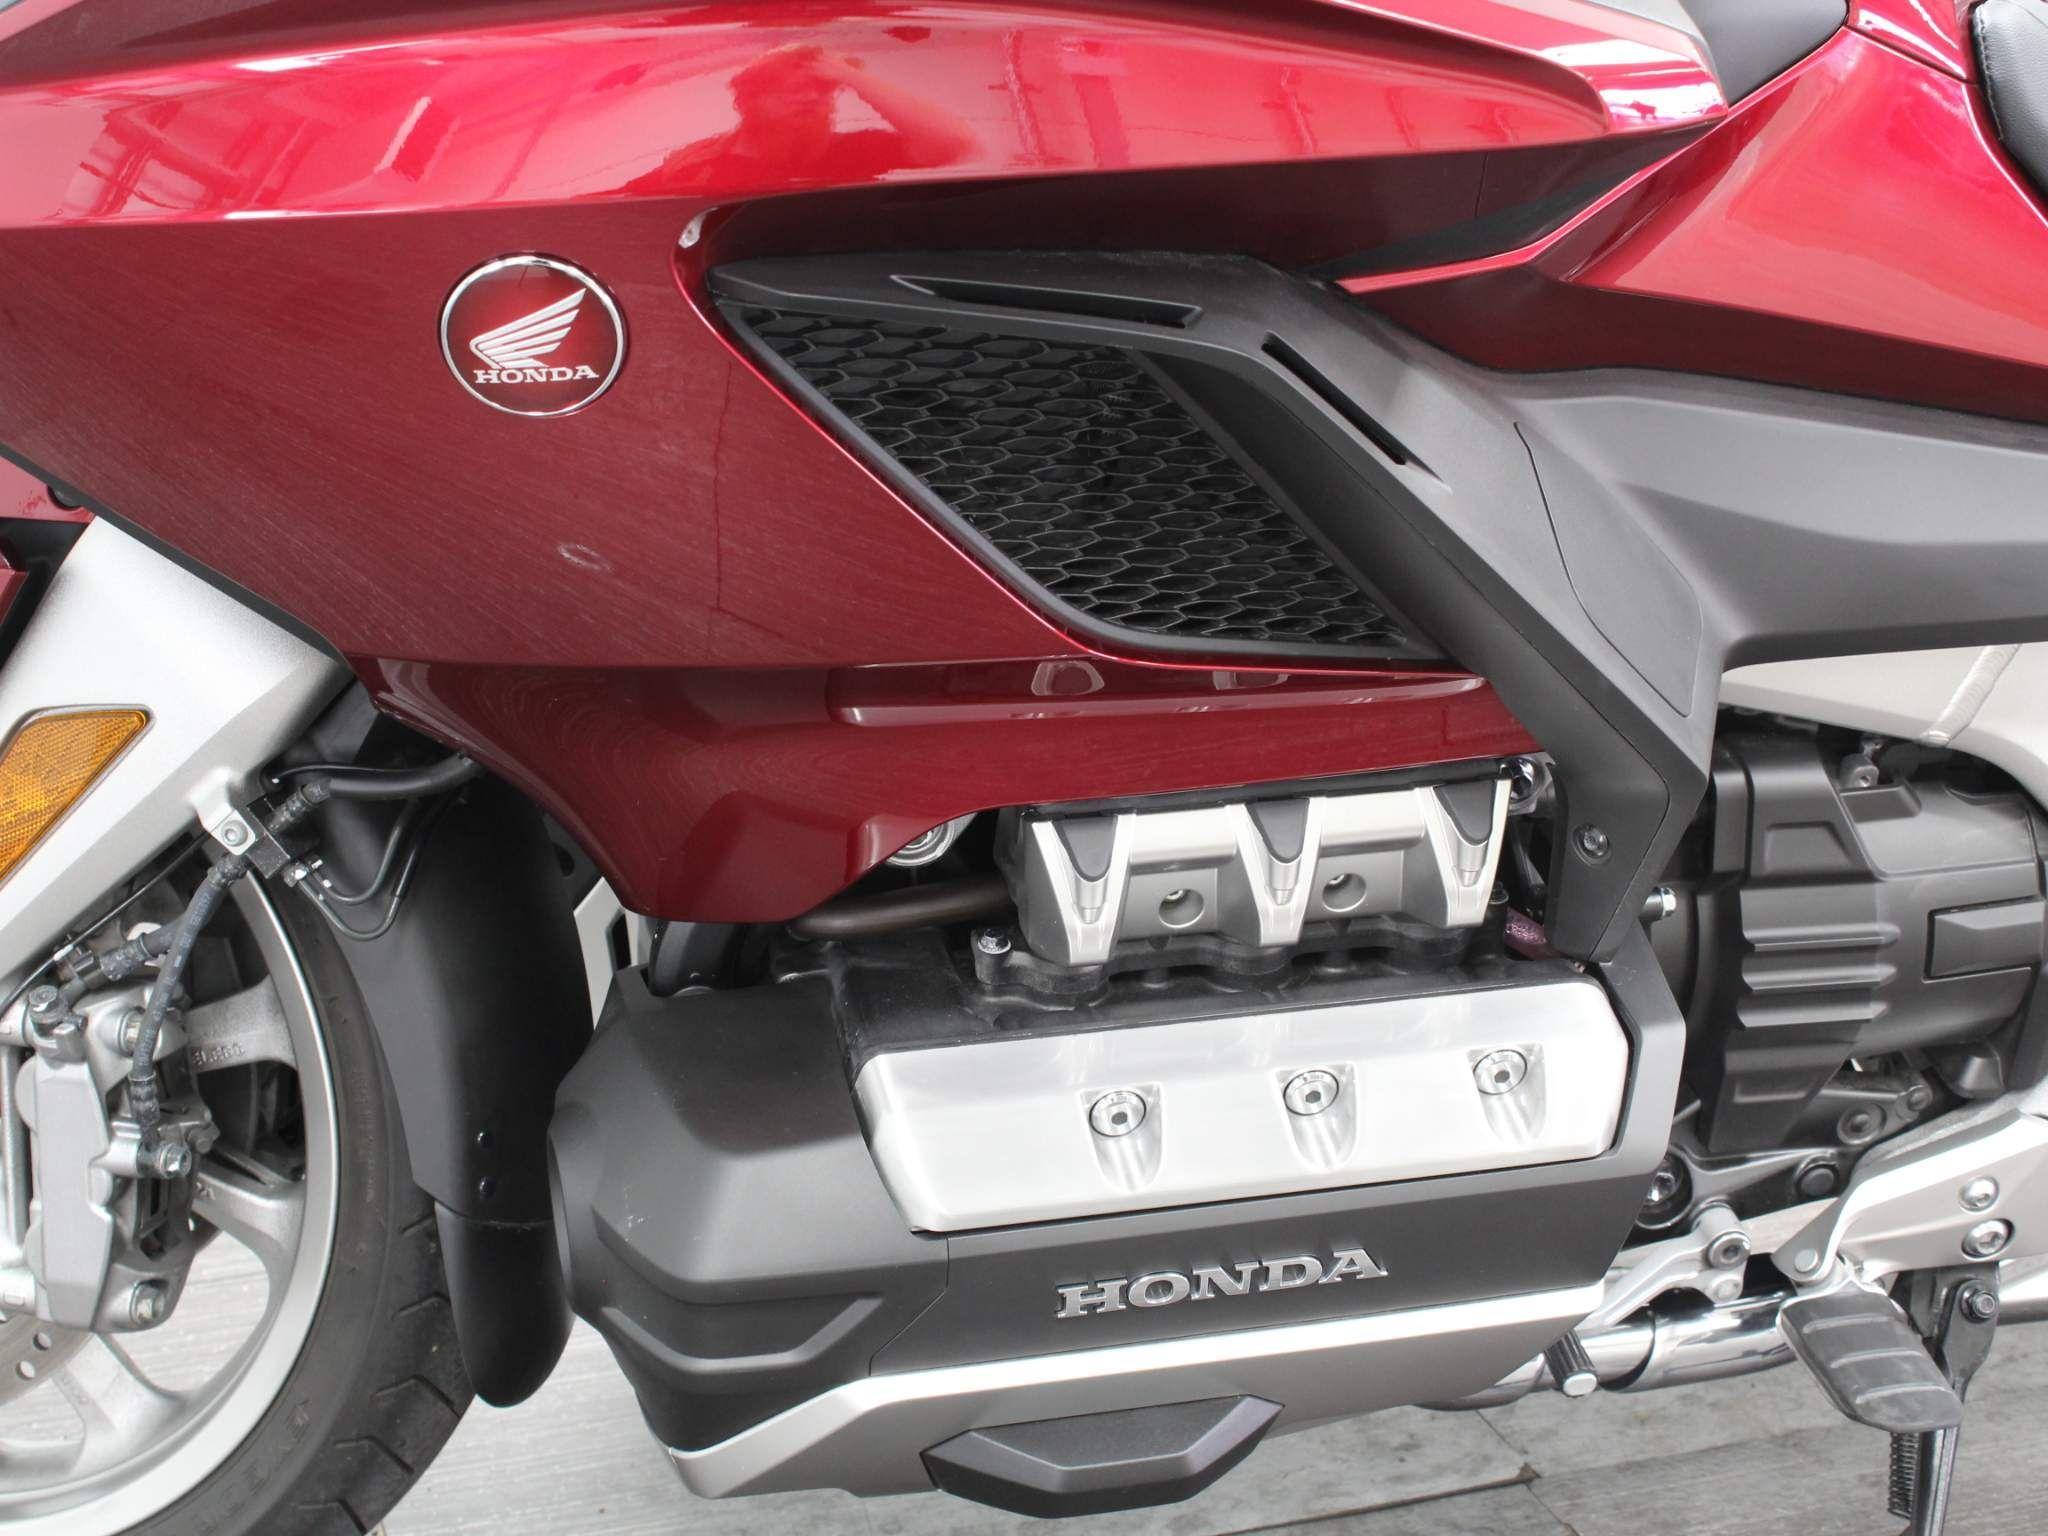 Honda GL1800 Goldwing Images